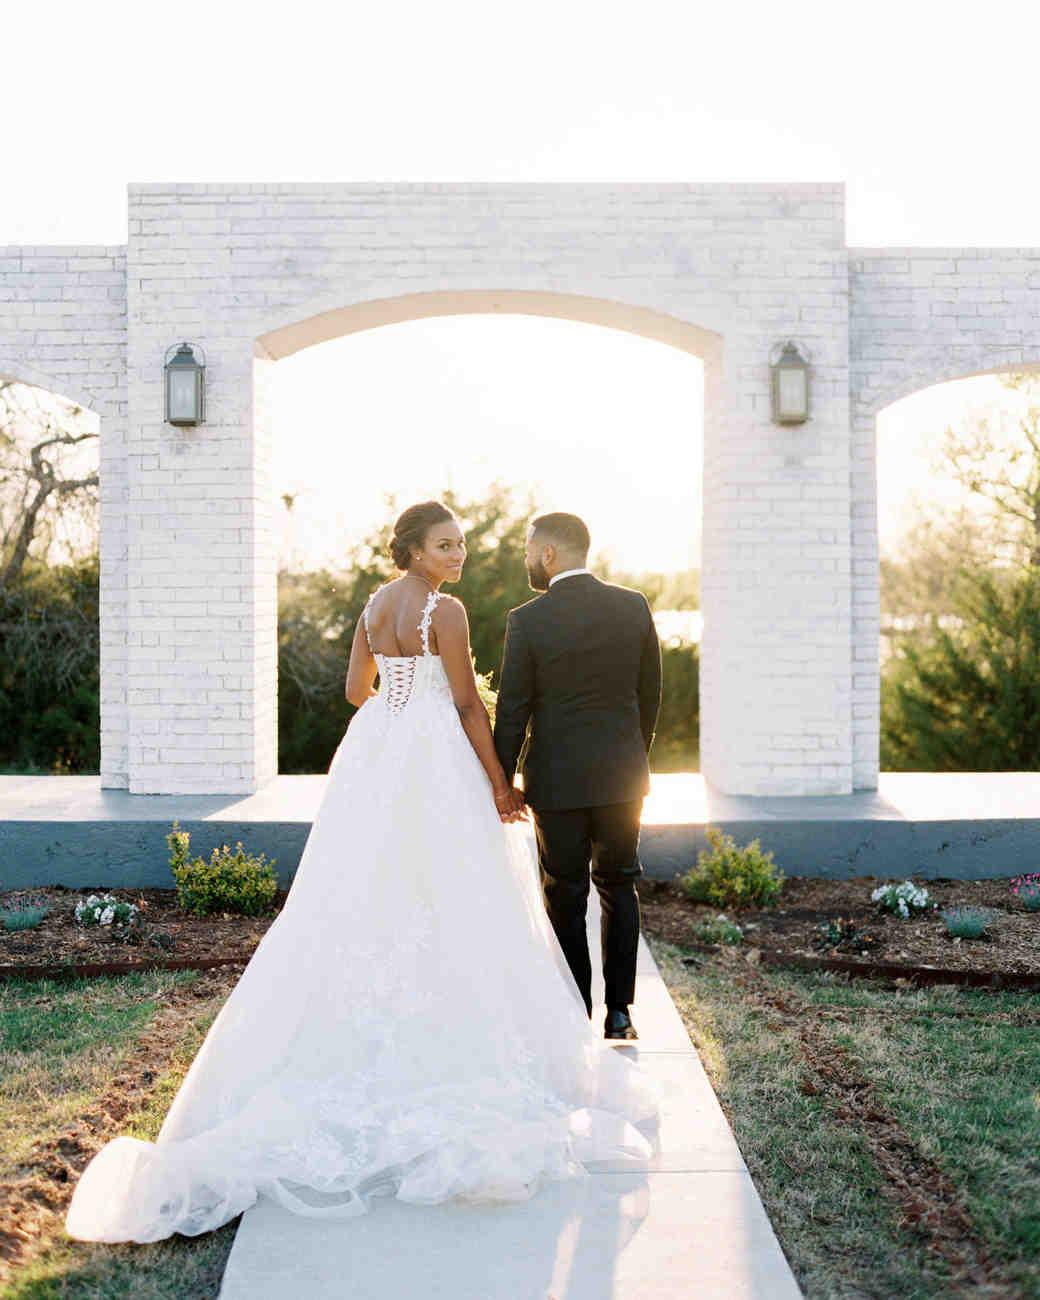 wedding couple walking holding hands